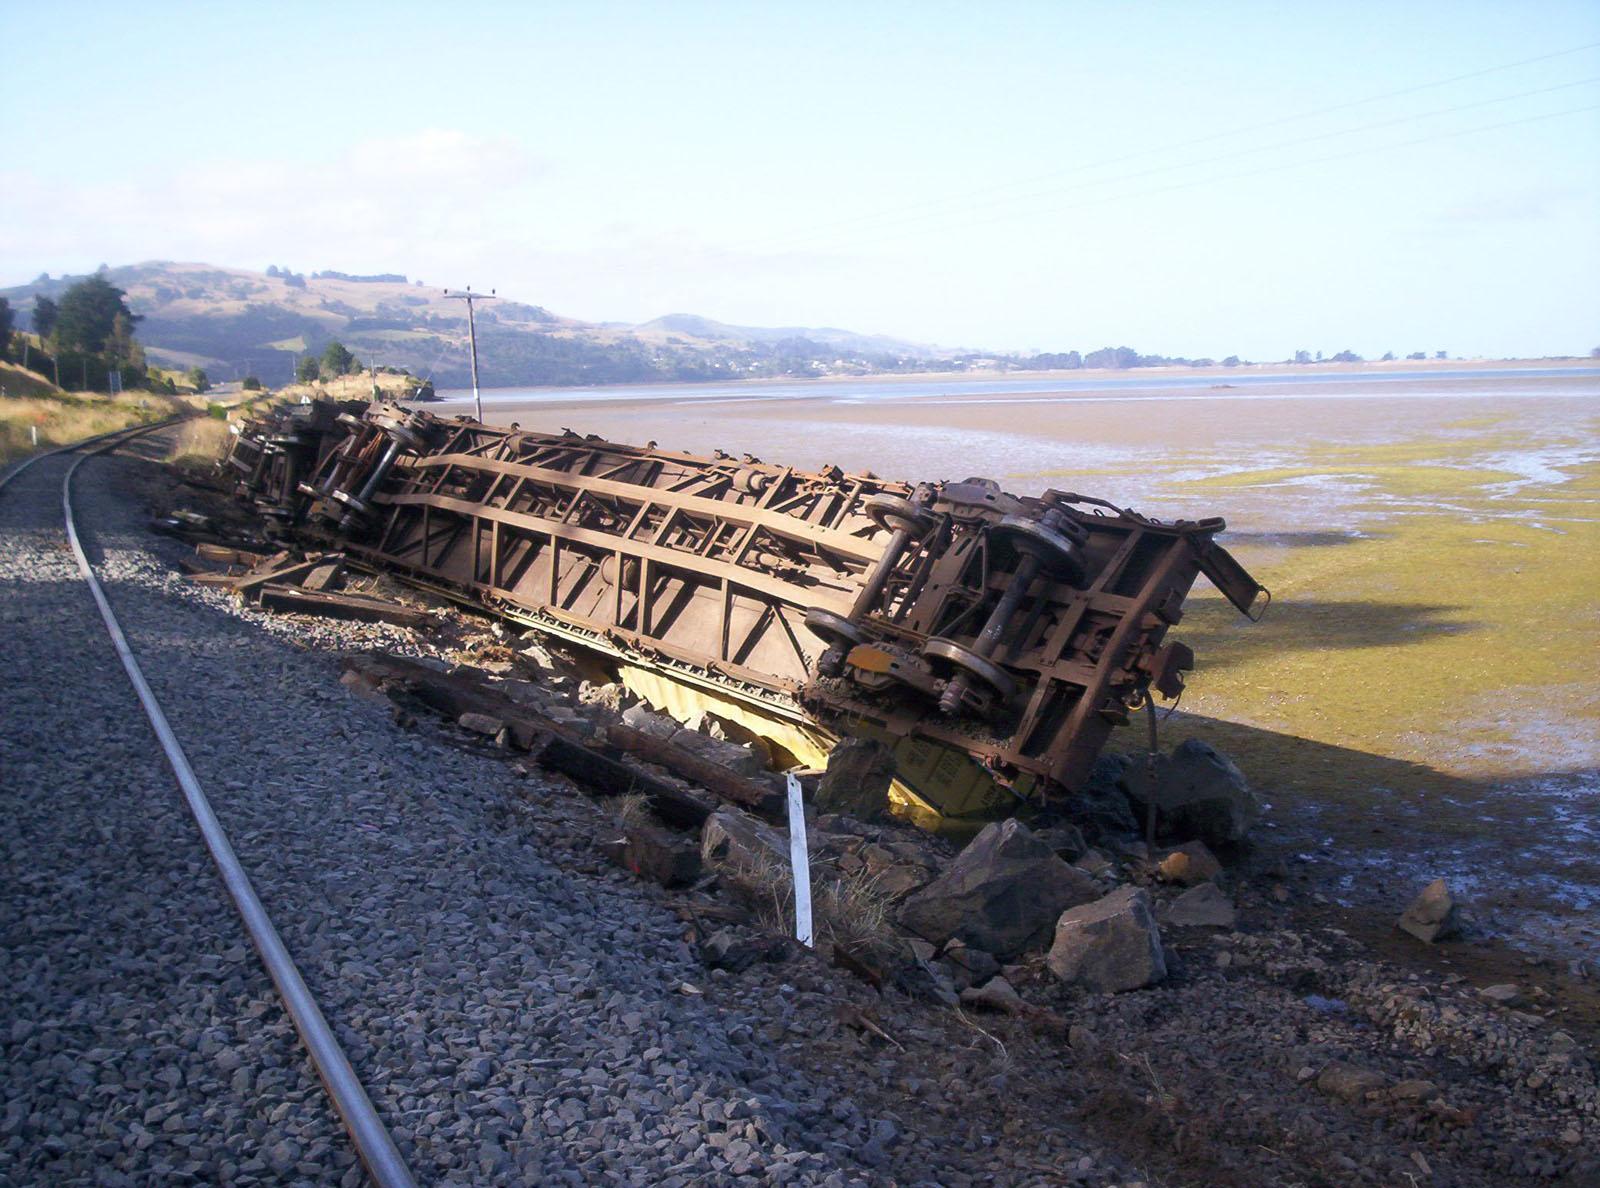 Rails, Bspo06, Crushed, Iron, Paint, HQ Photo